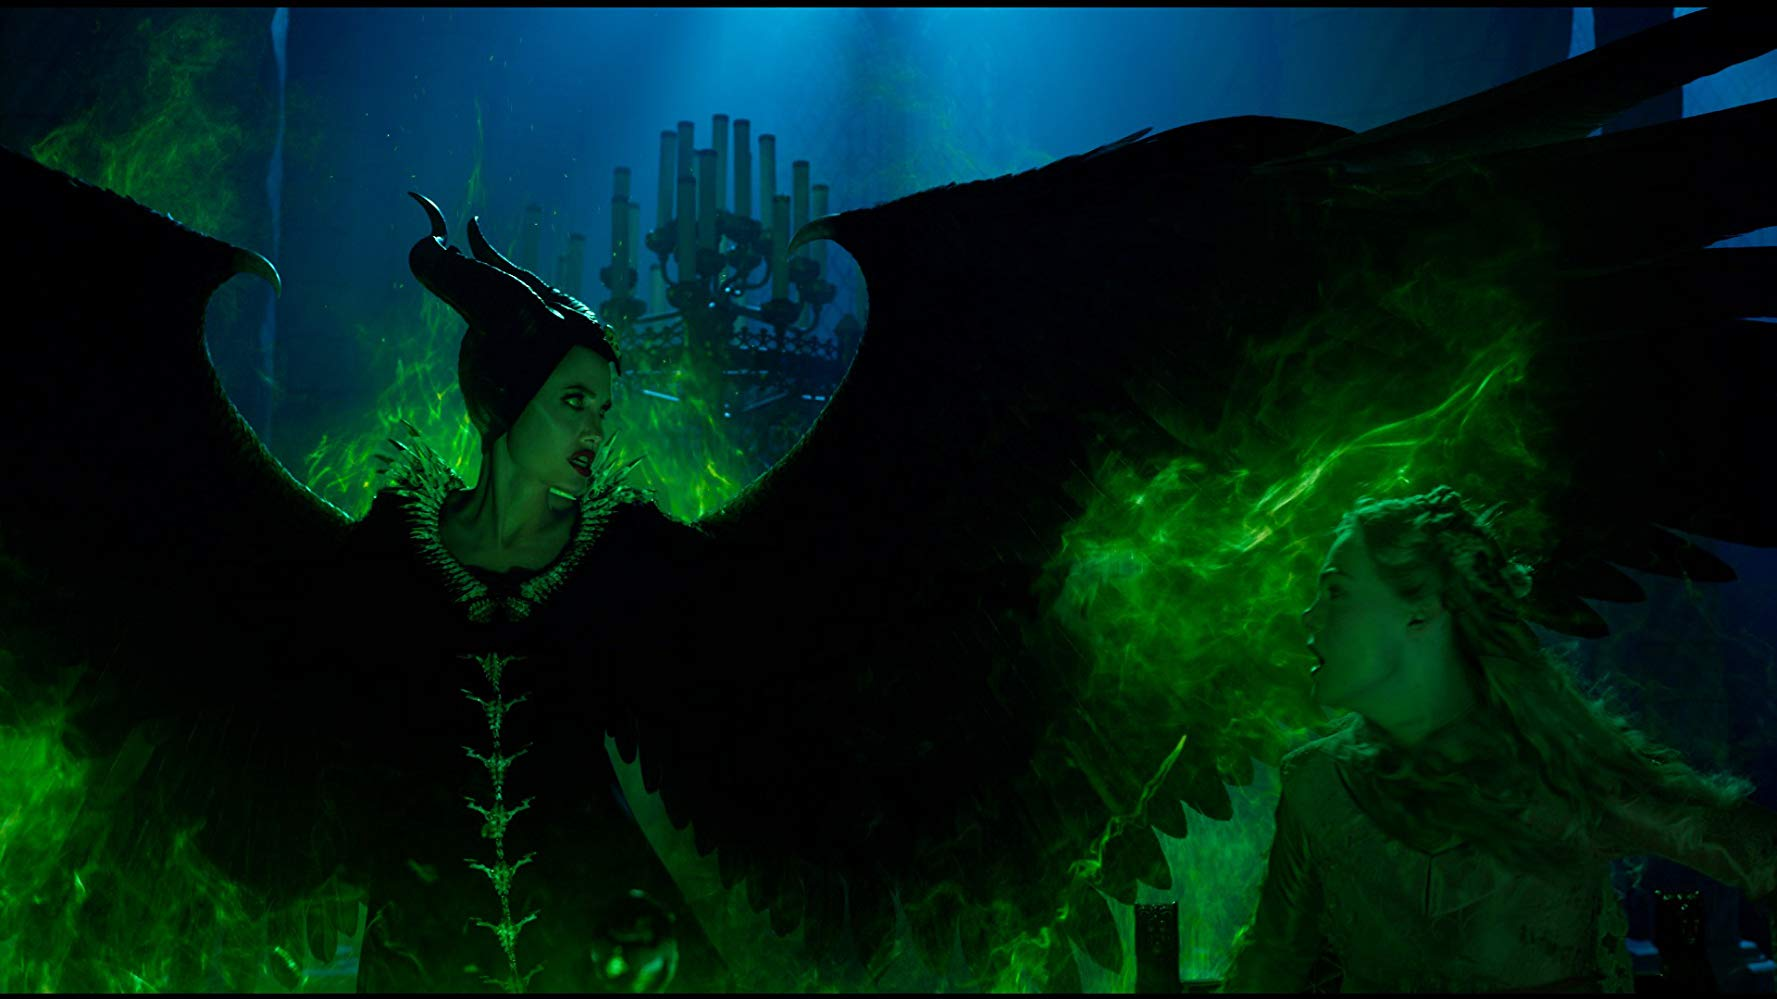 Maleficent-Mistress of Evil-Disney